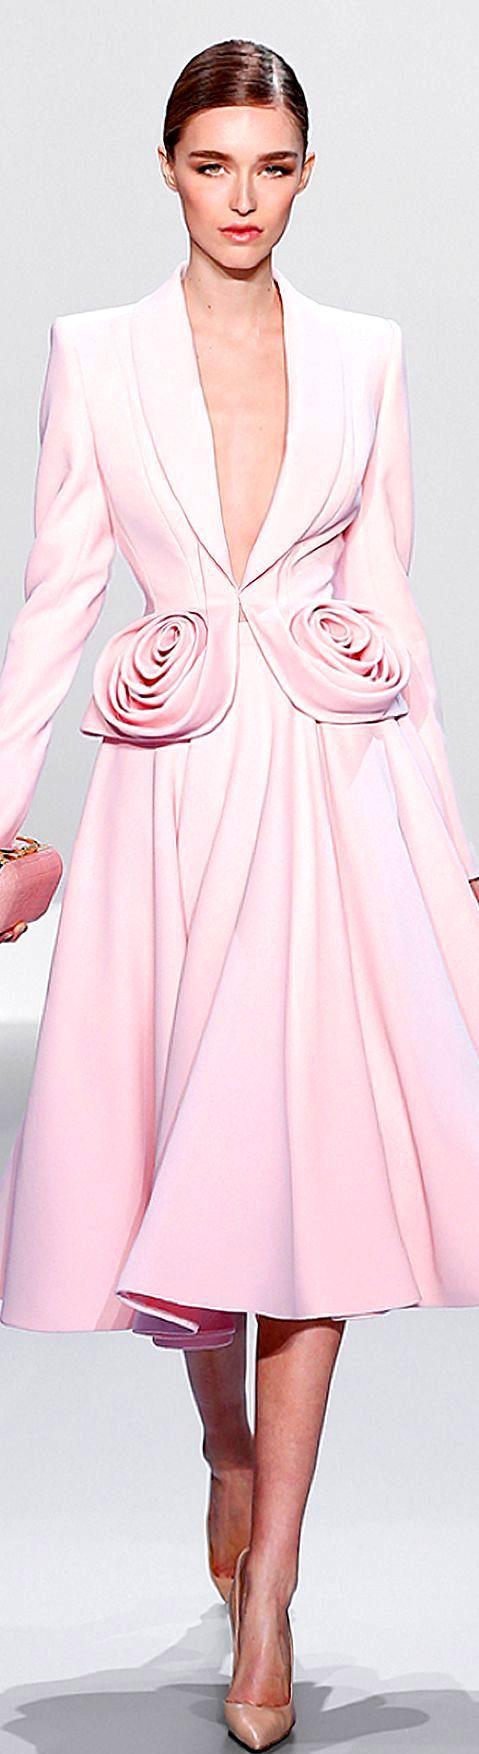 PINK & PURPLE PRINTED DRESSES